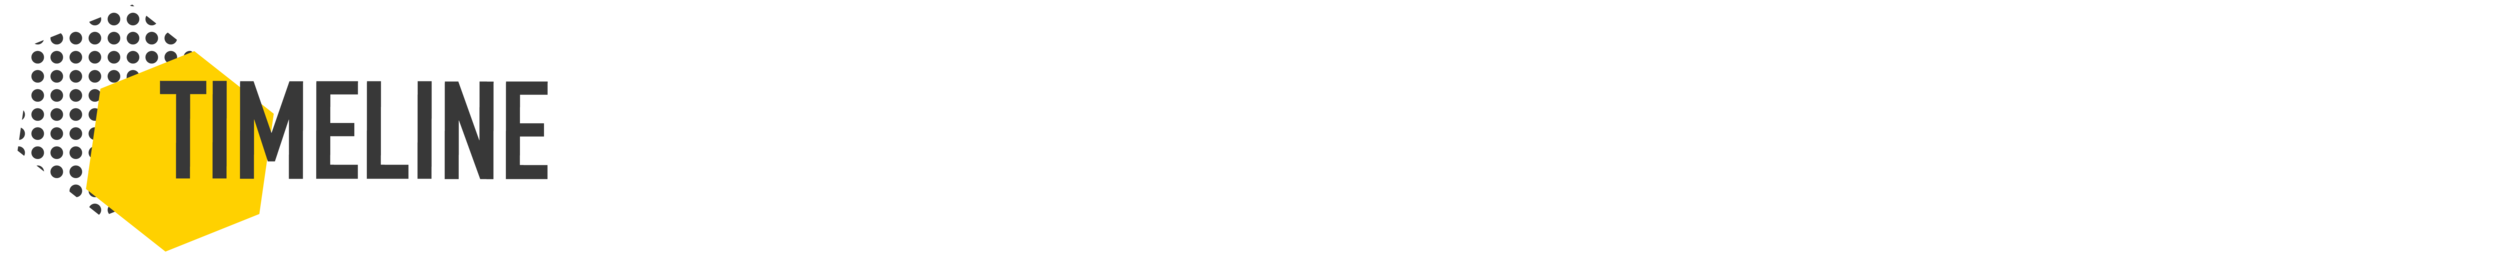 1st Backer Web TITLE-04.png